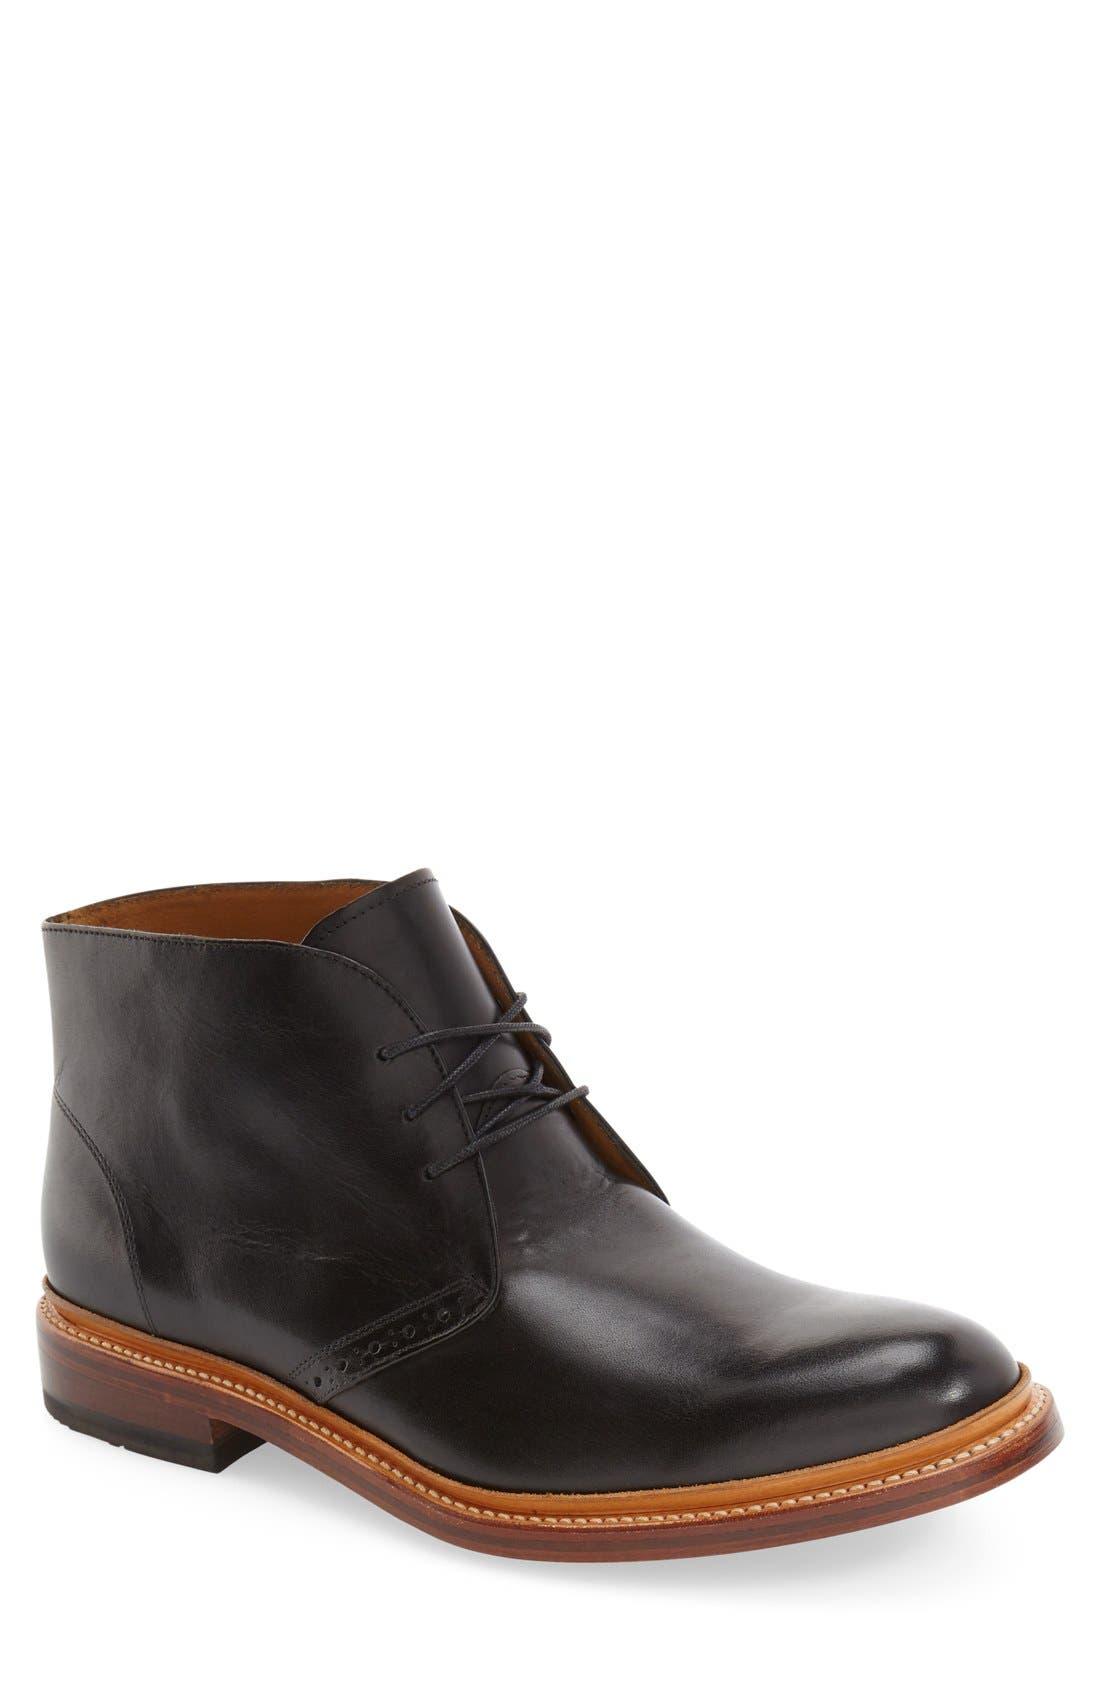 'Madison II' Chukka Boot,                         Main,                         color, Black Smooth Leather